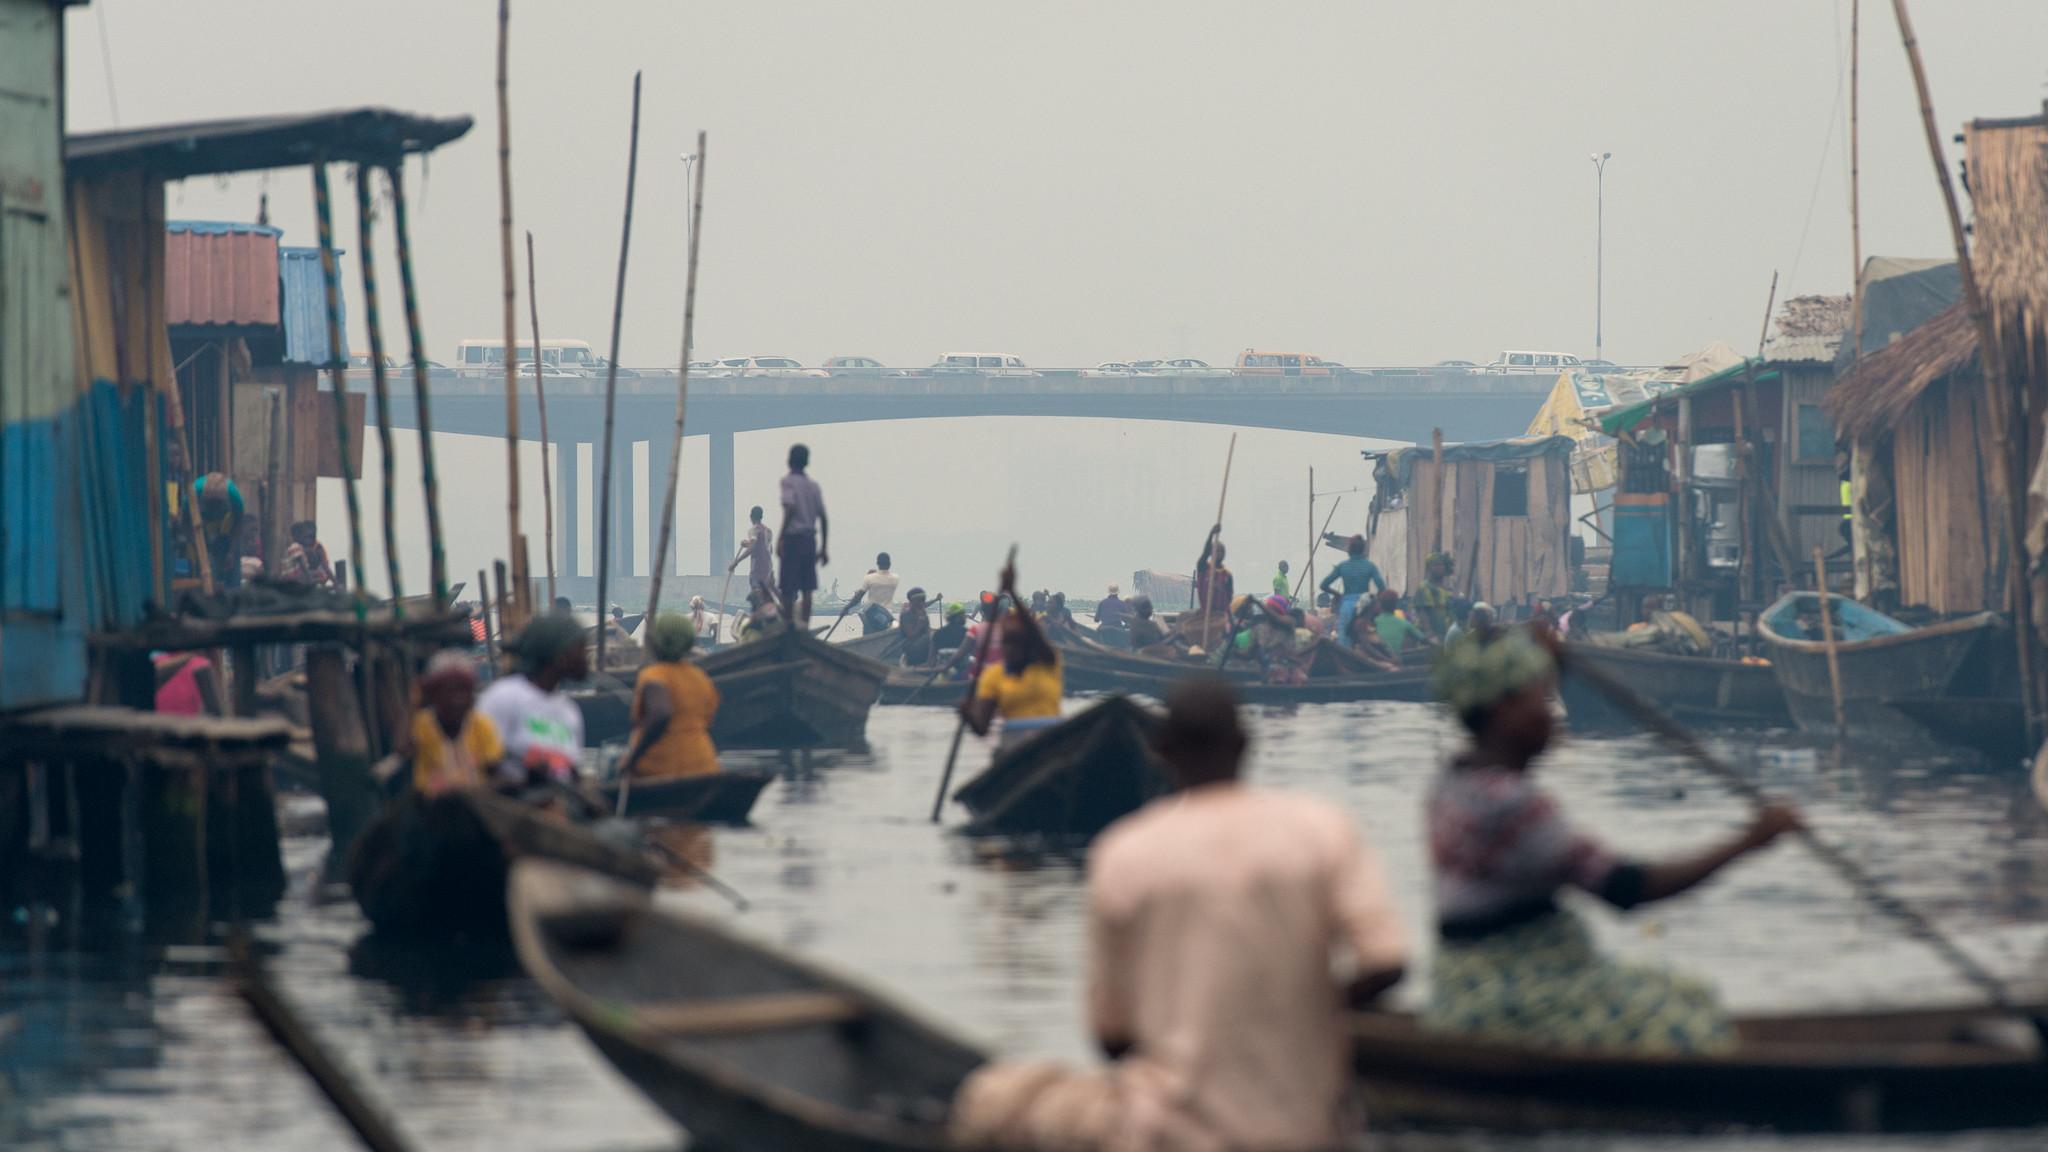 Makoko and the Bridge